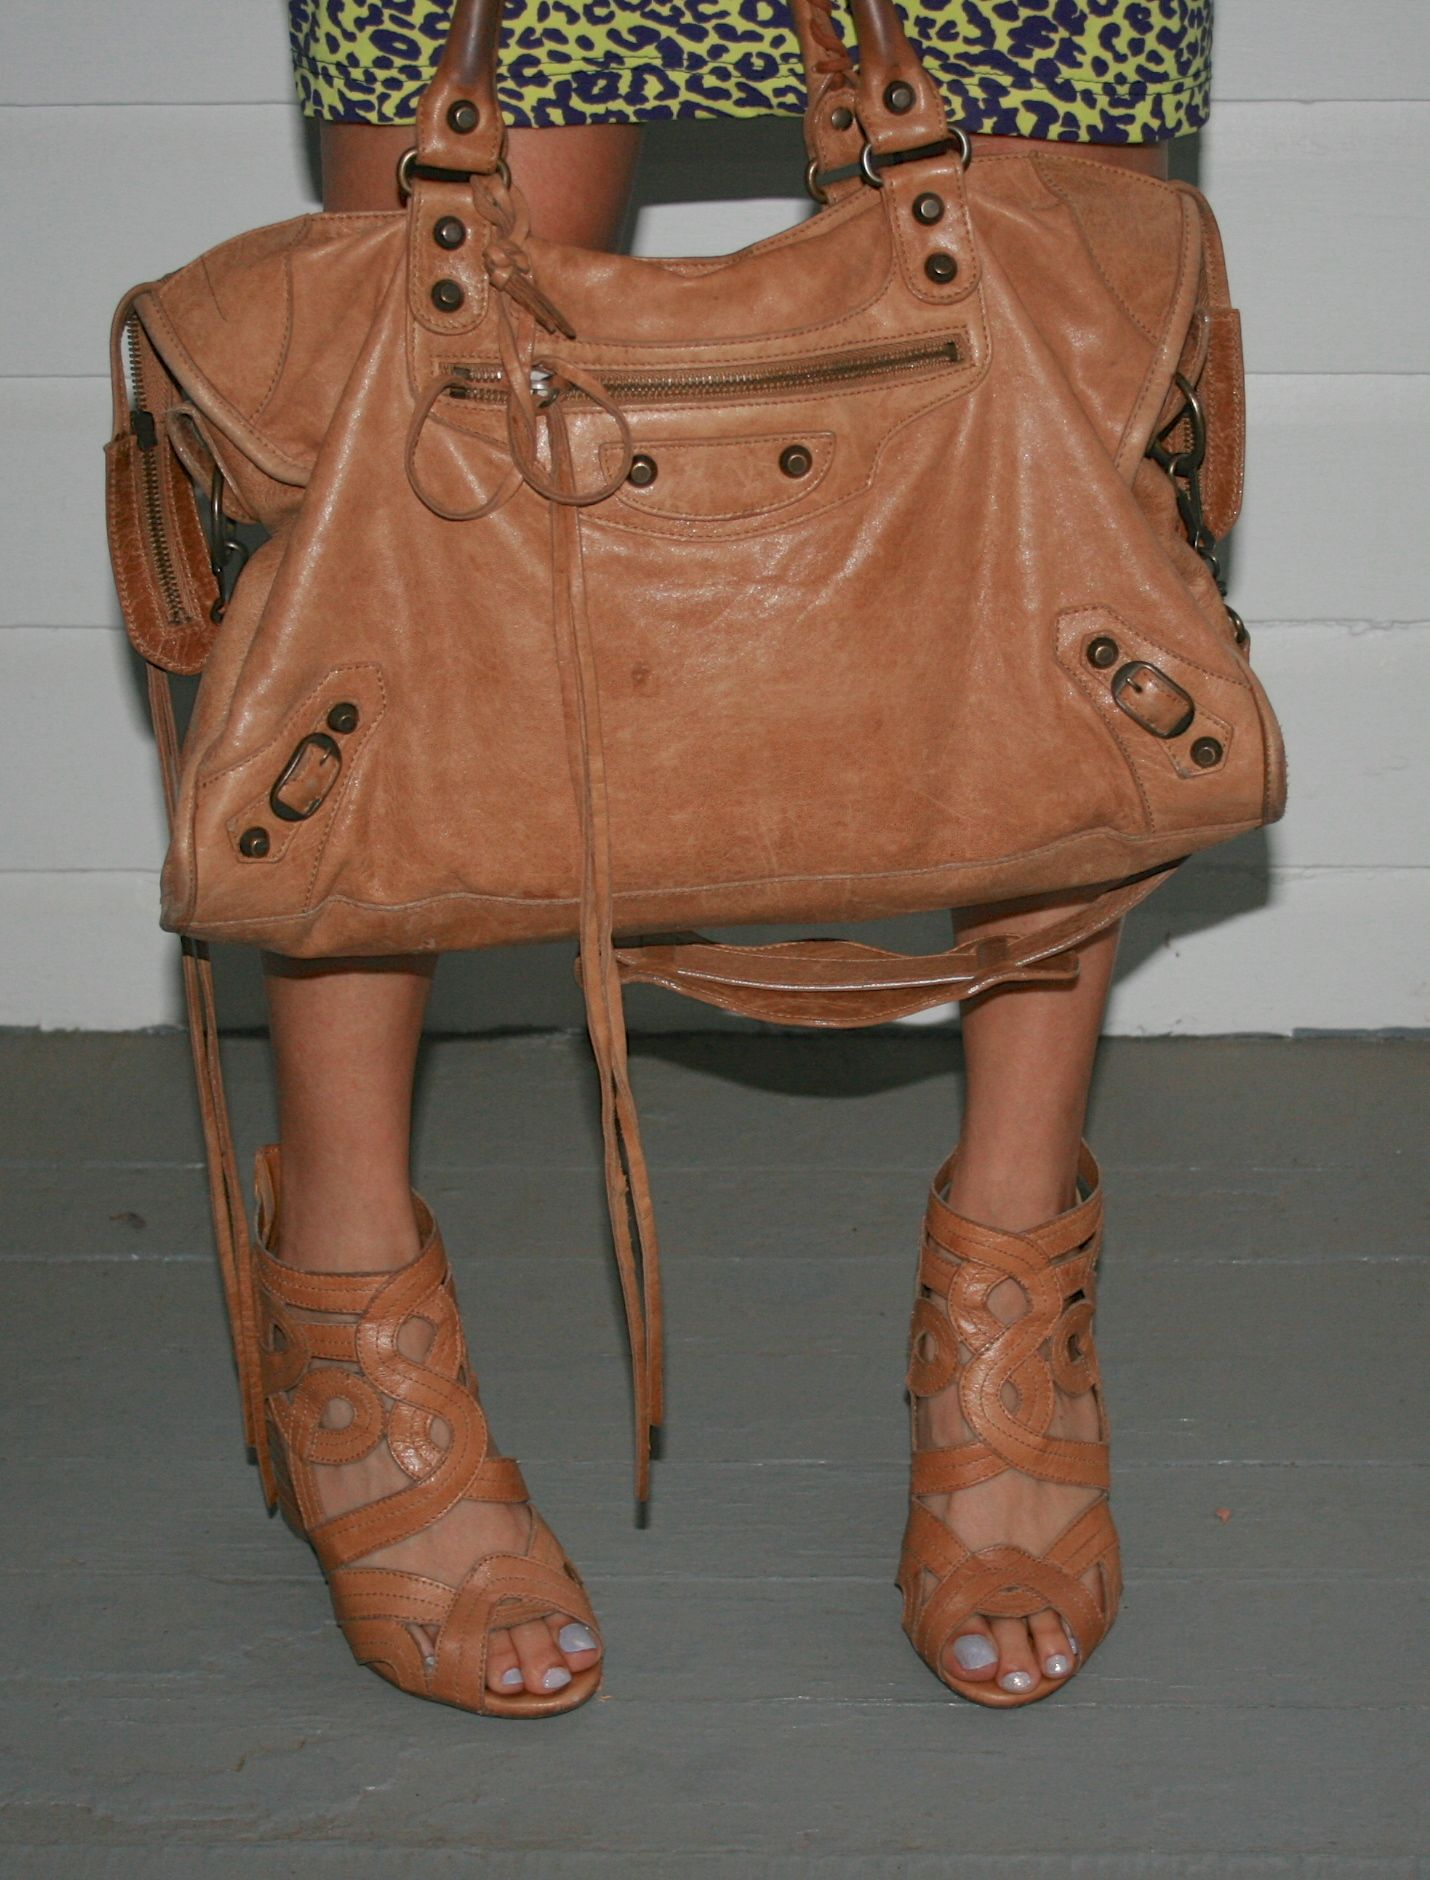 abdb630dc4d1 Love the brown Balenciaga bag   shoes!